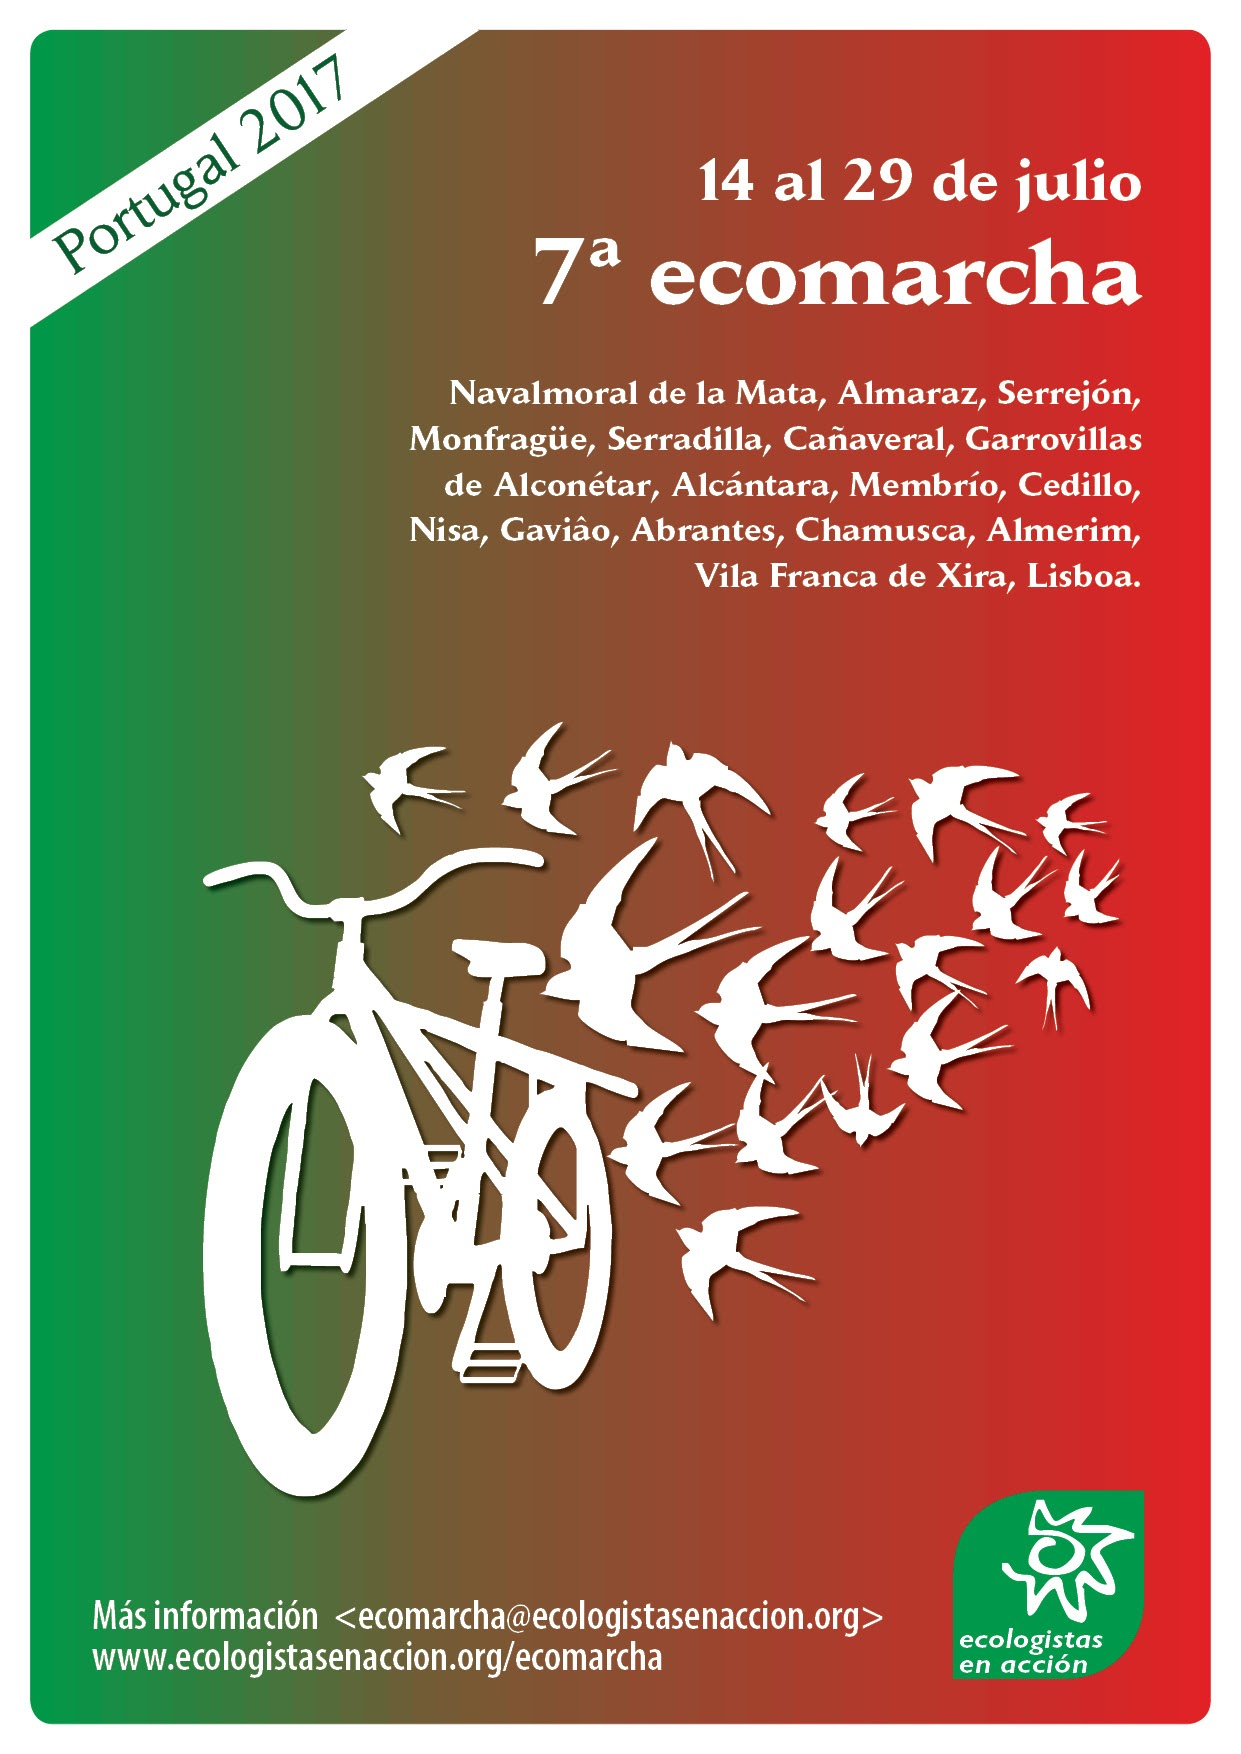 ecomarcha-2017-Río tajo. España Portugal